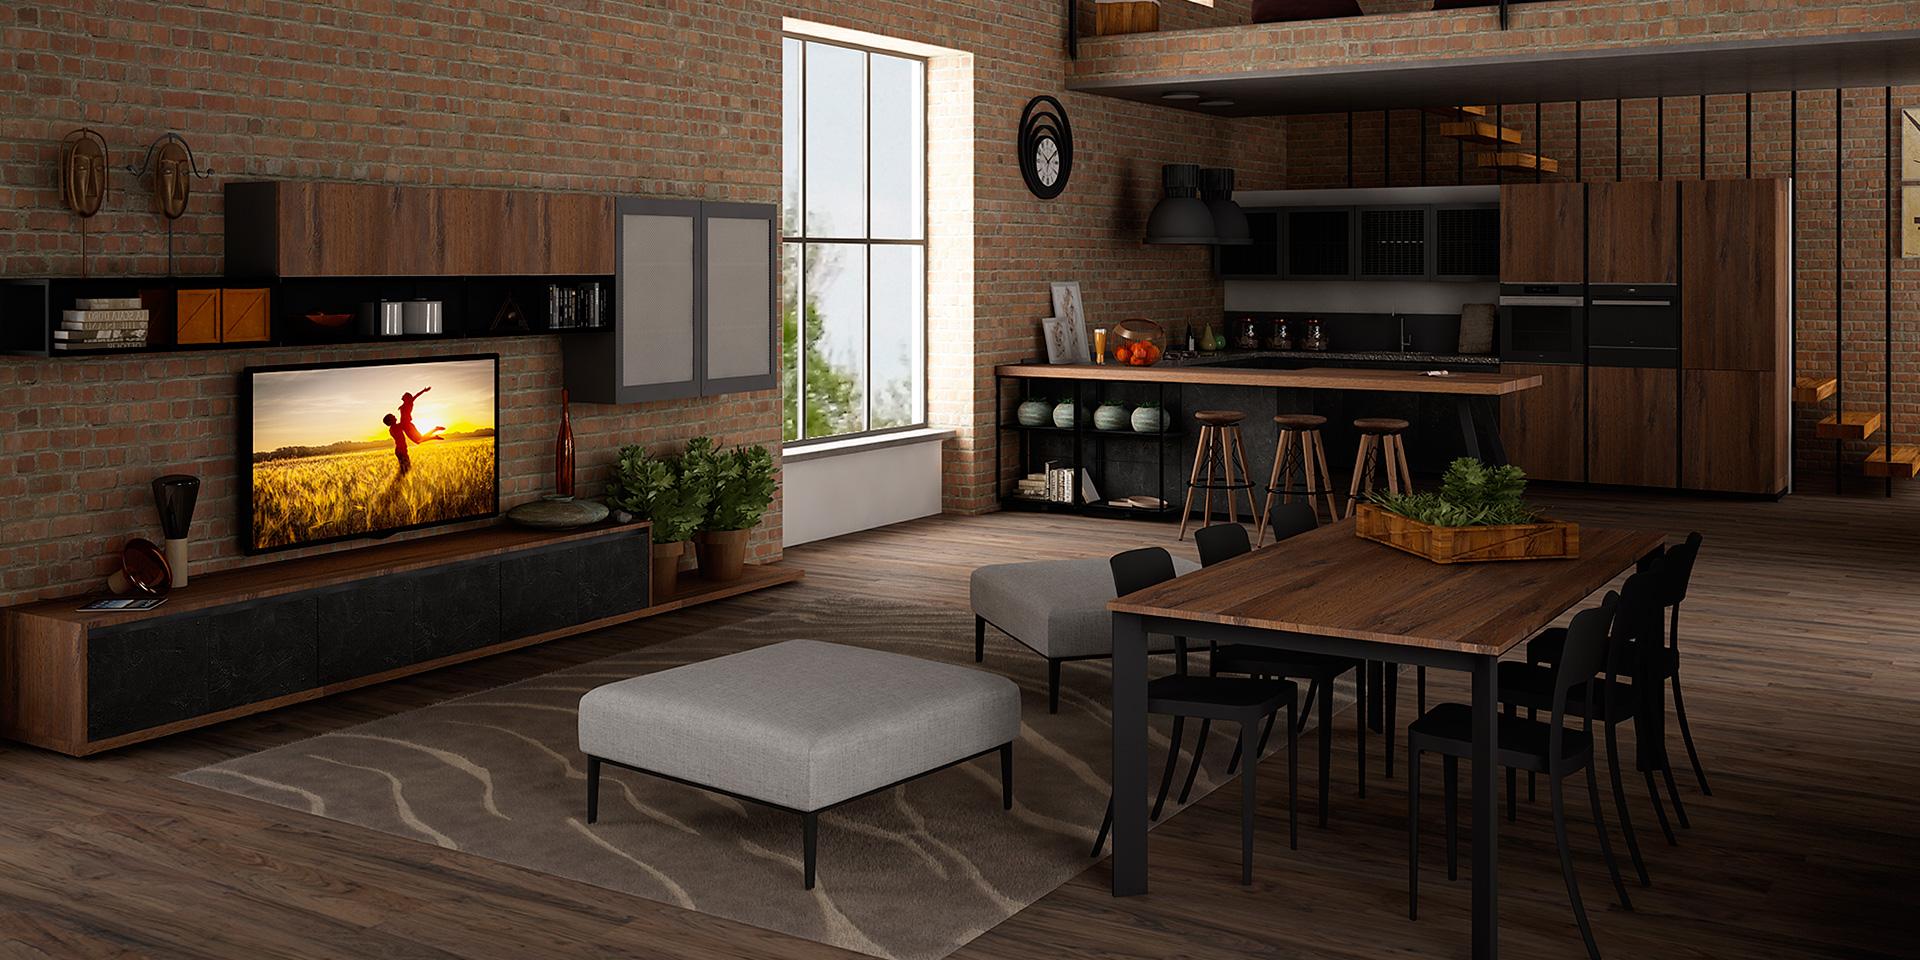 Eleganza in stile industriale - Cucine Lube